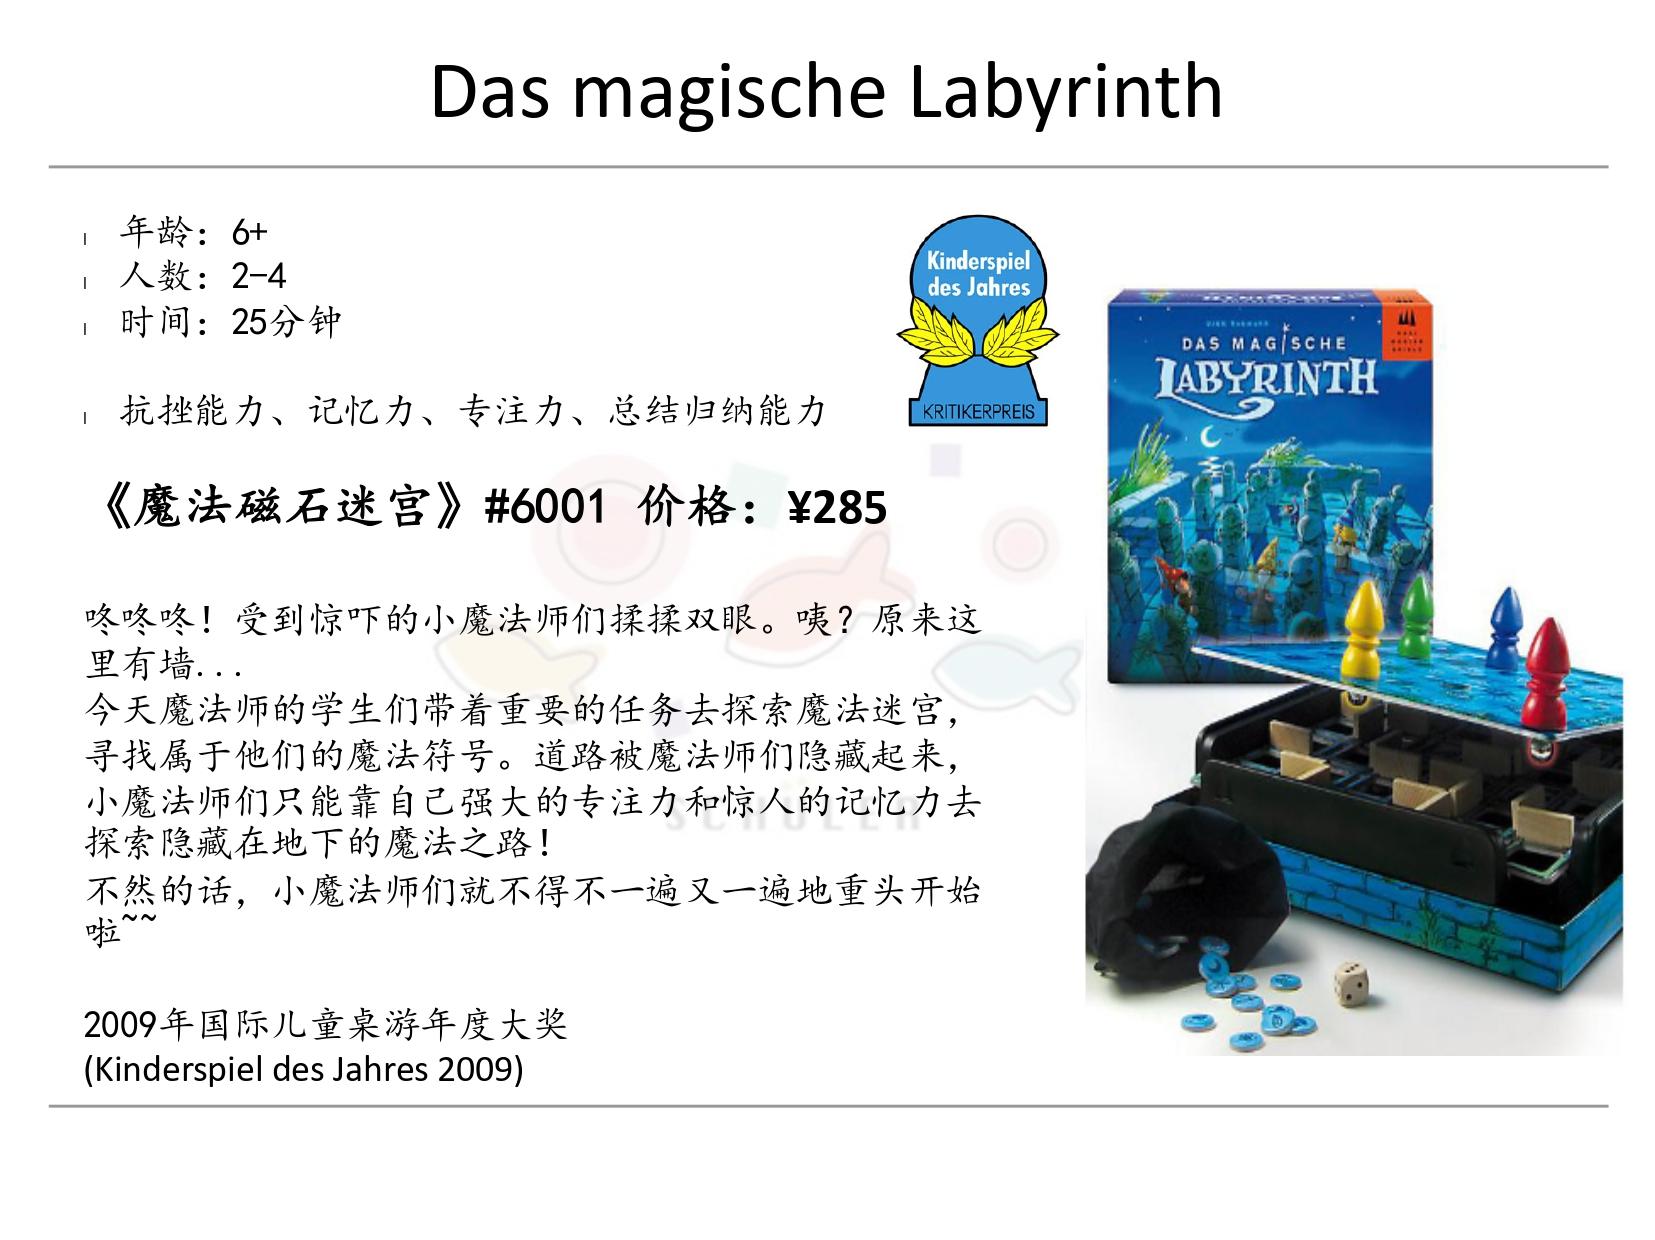 Das magische Labyrinth 磁石魔法迷宫